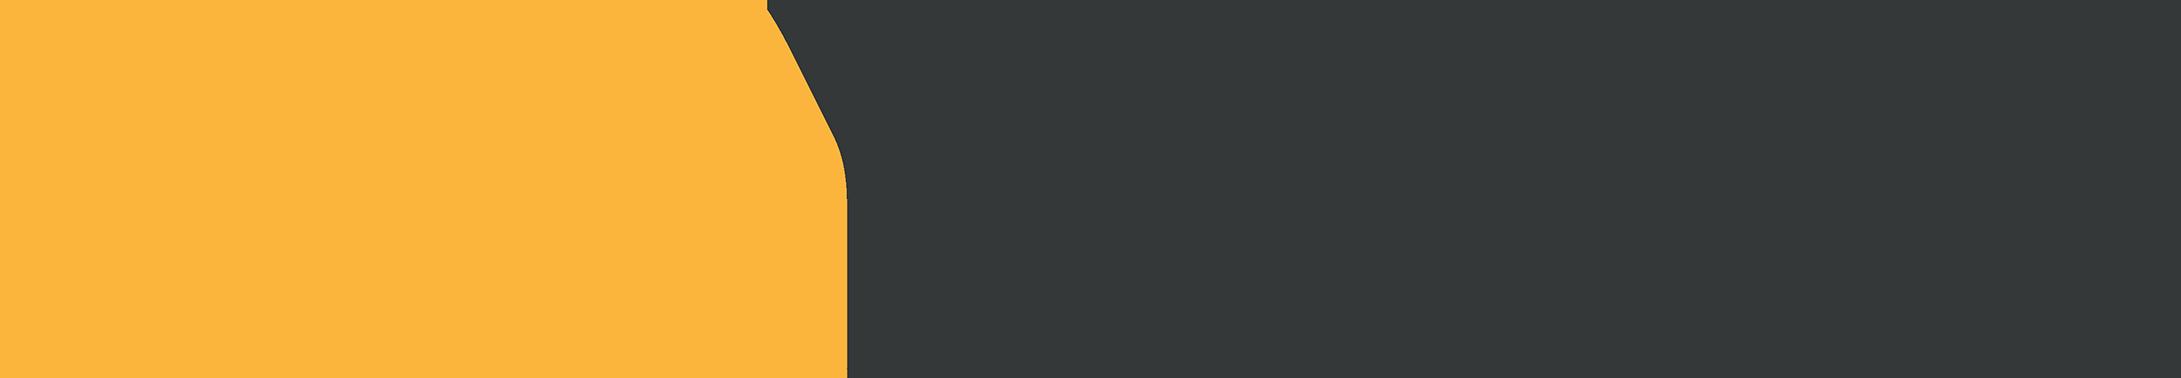 Idealever logo